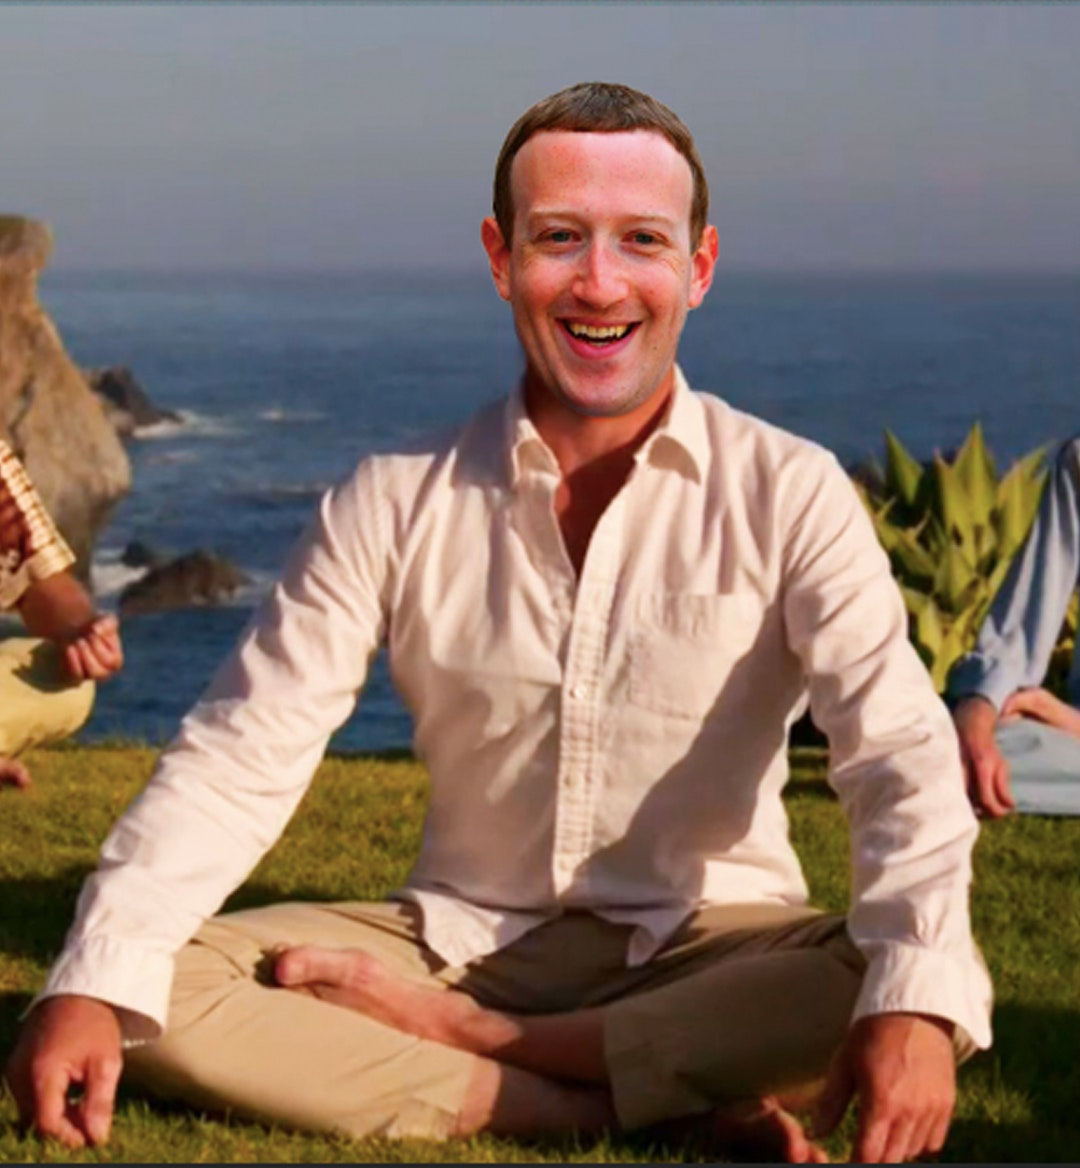 Facebook renewable energy mobile